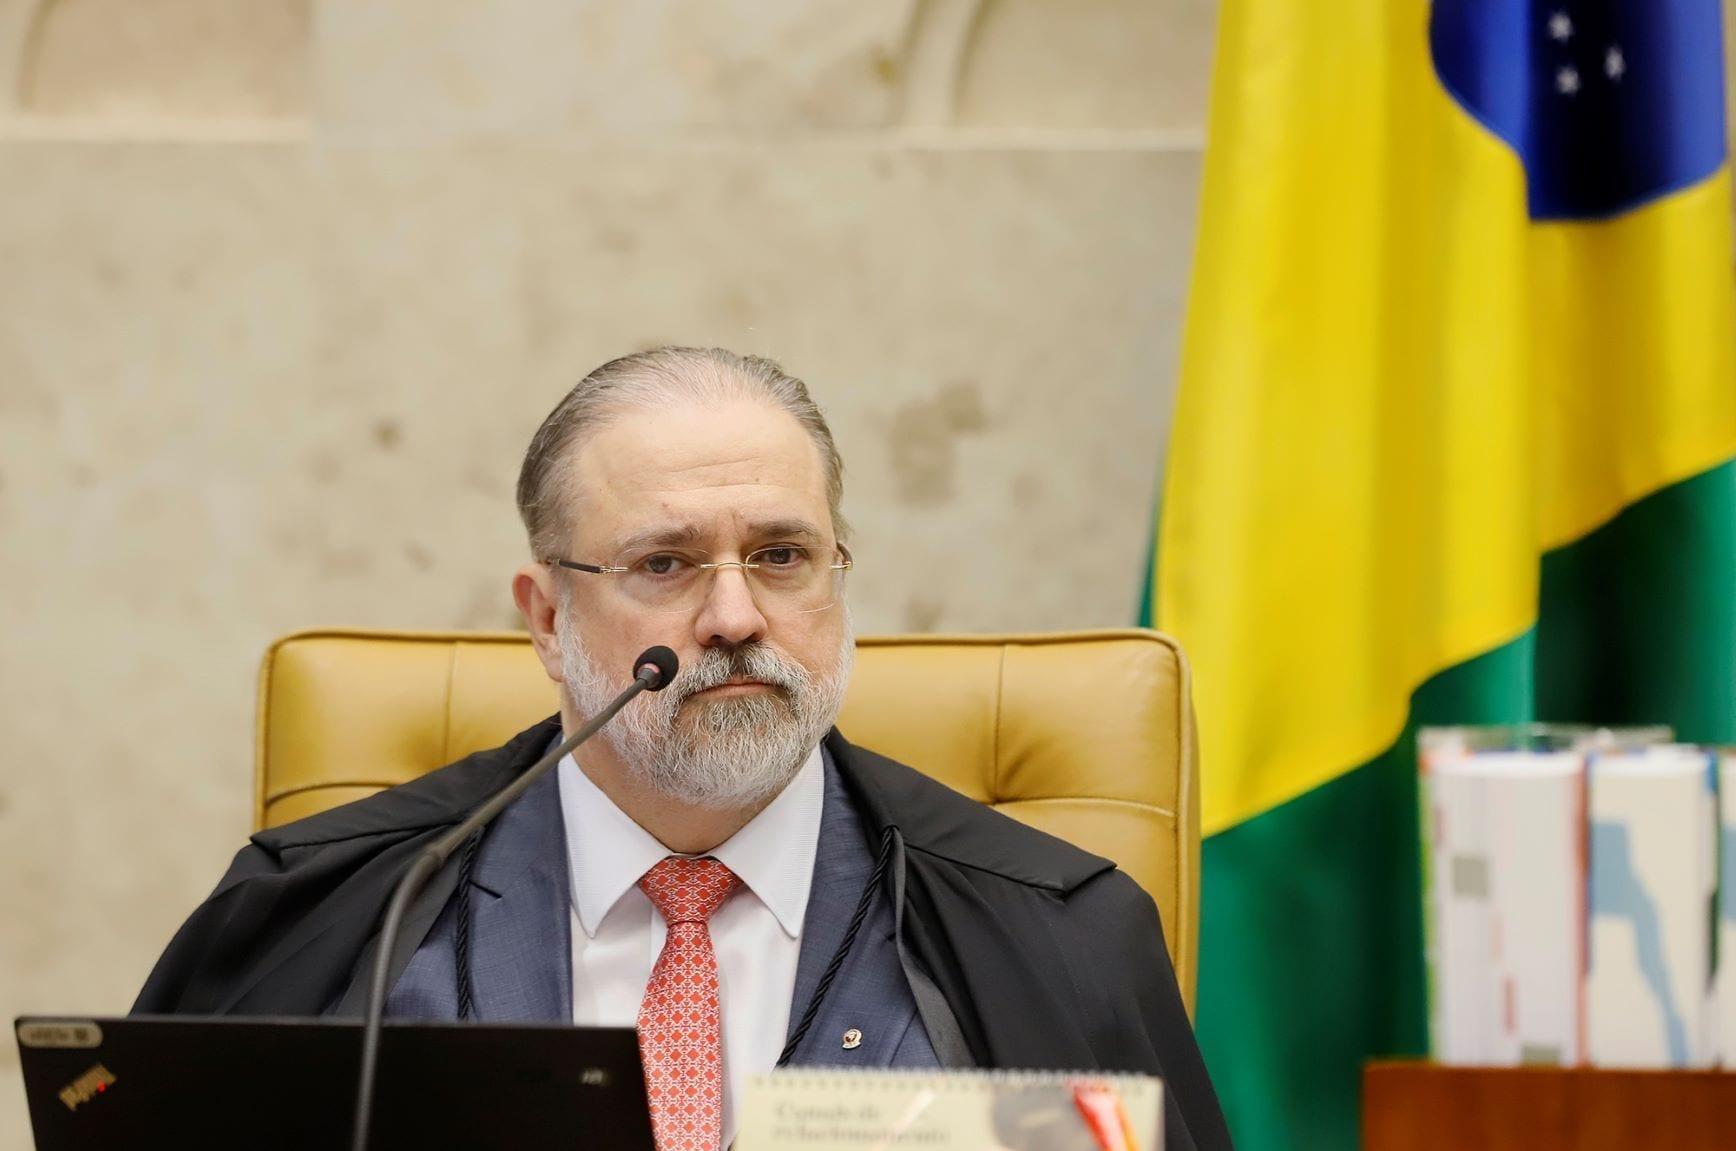 Augusto Aras processa Conrado Hübner